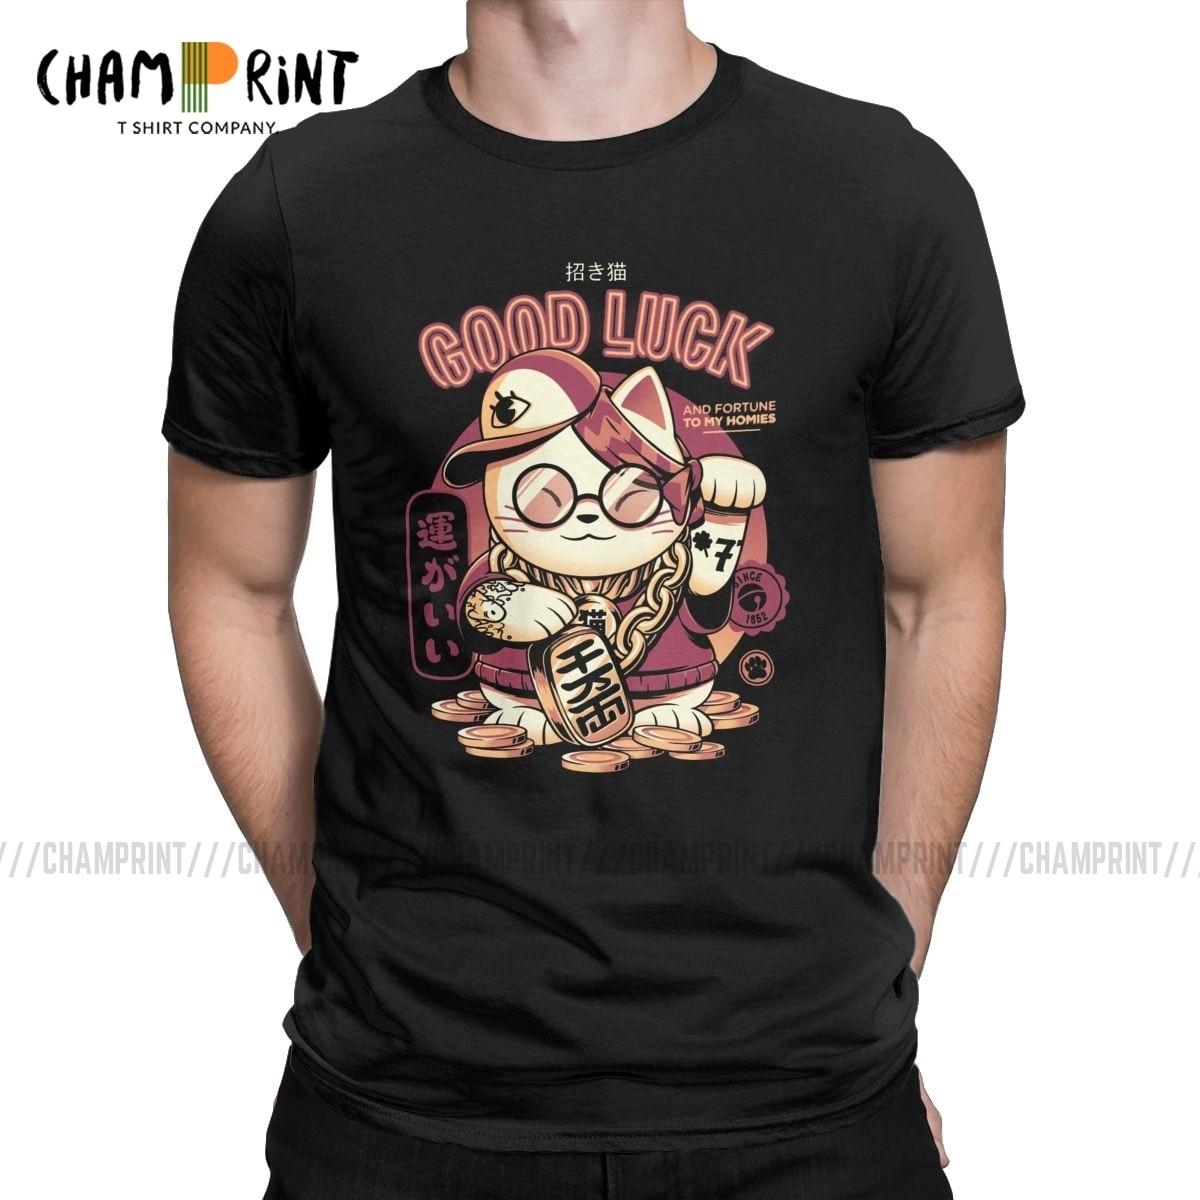 Camiseta de hombre gato de la suerte divertida manga corta Camiseta de algodón Maneki Neko Japón gato de La Fortuna camisetas de cuello redondo ropa de talla grande